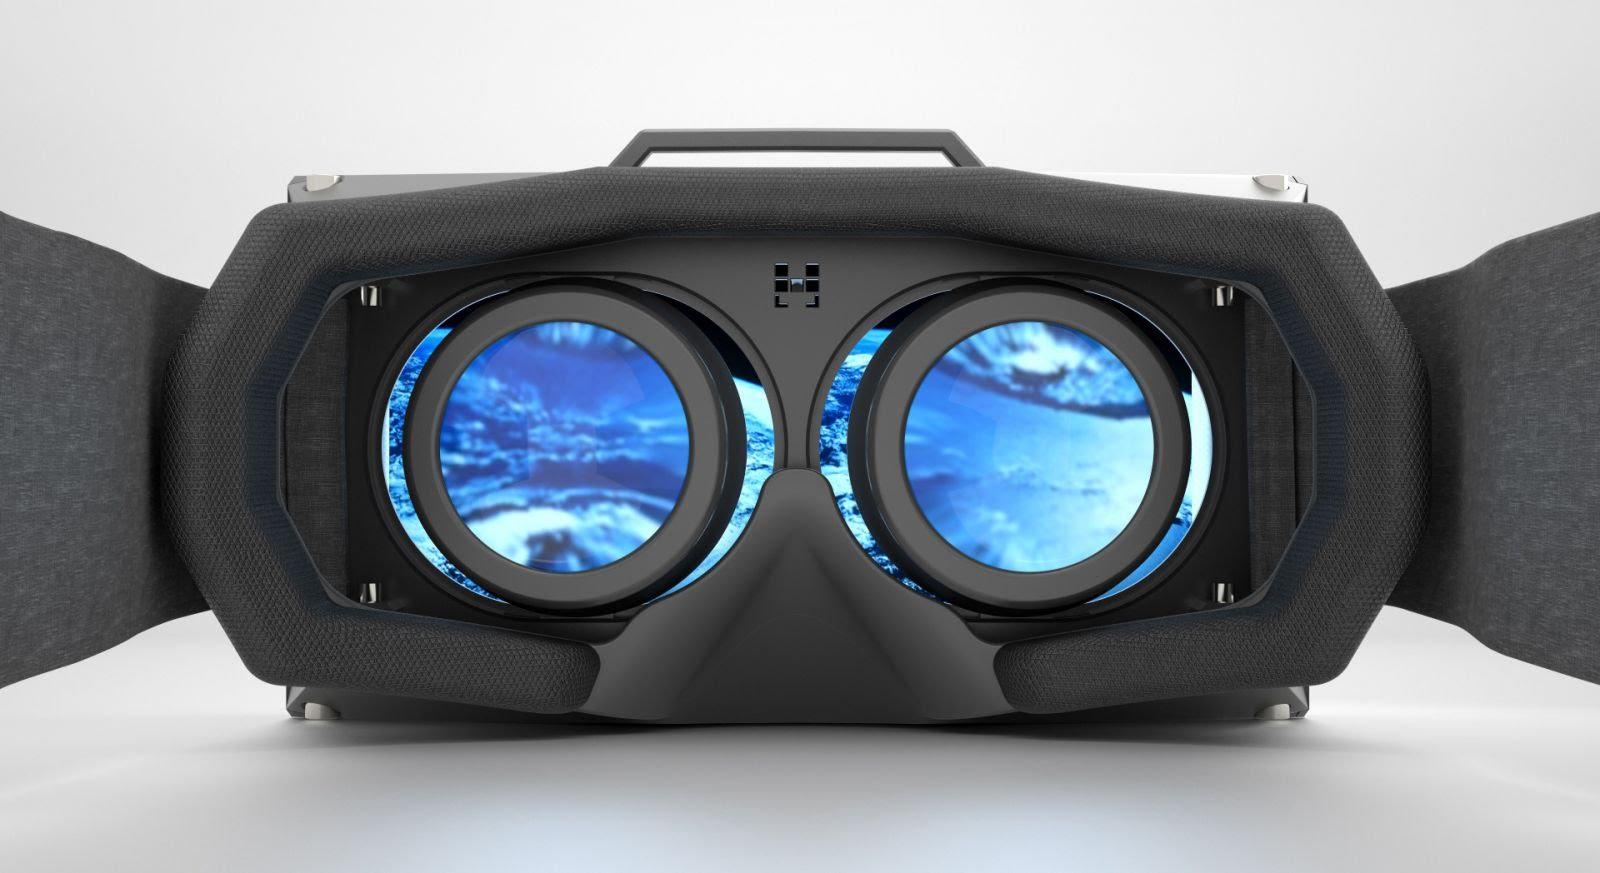 Photo of VR-устройства начнут передавать запахи vr VR-устройства начнут передавать запахи maxresdefault